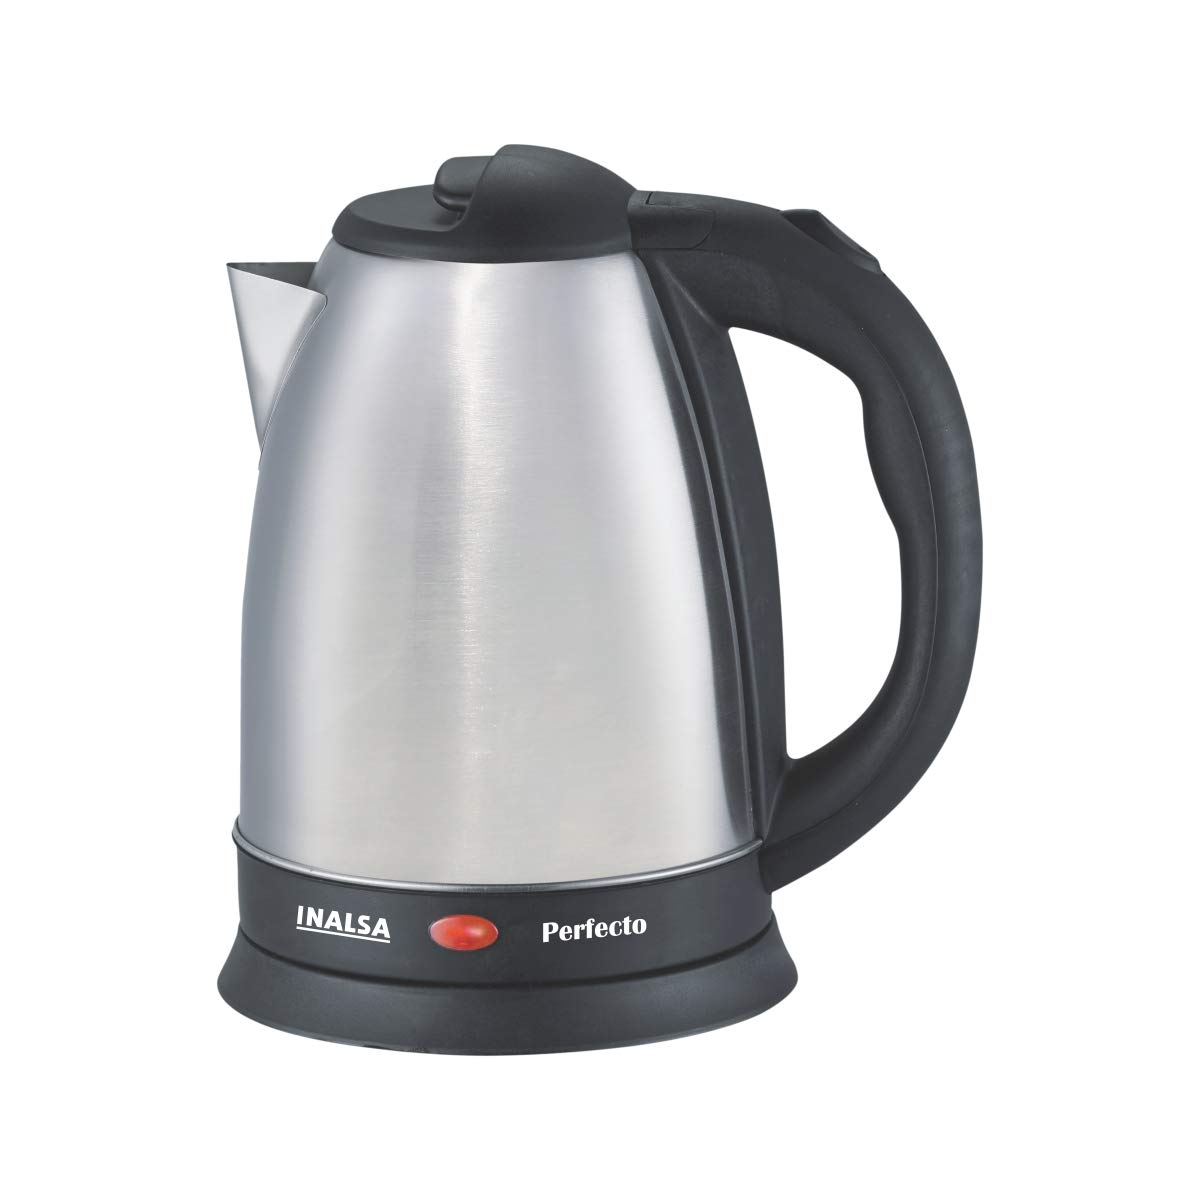 Inalsa Perfecto 1.5-Litre Electric Kettle (Silver/Black)